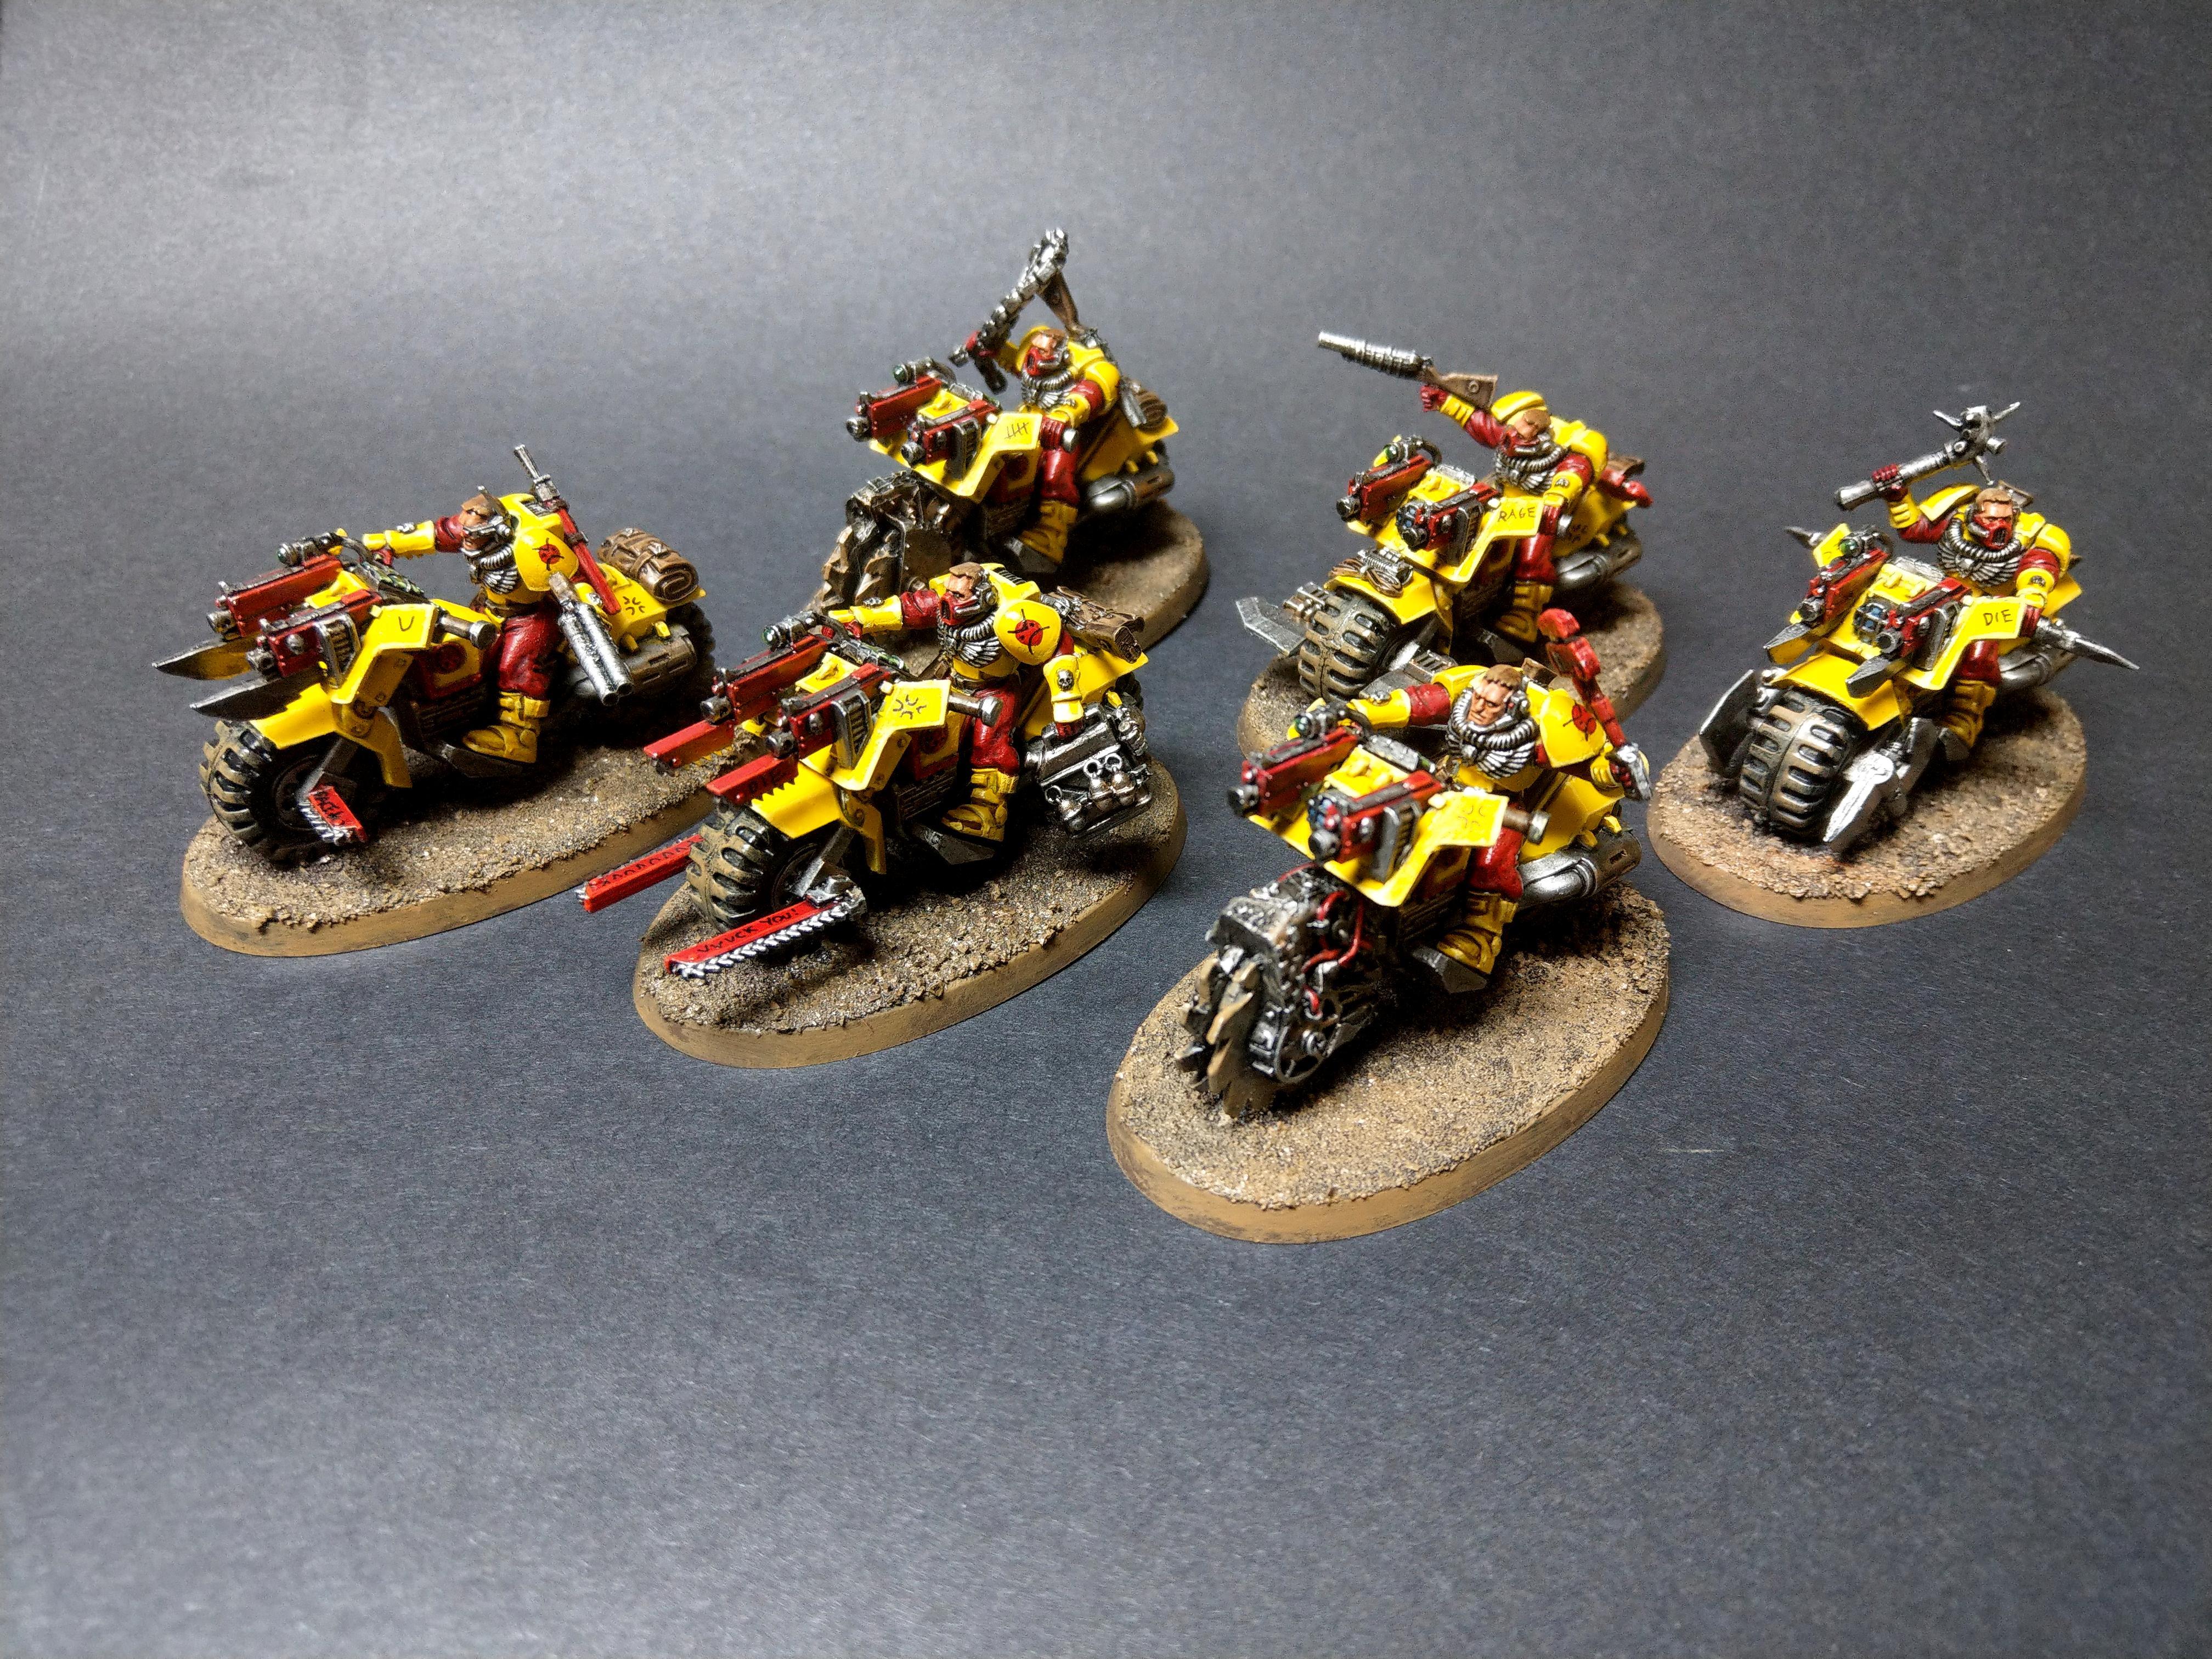 Angry, Bike, Space, Space Marines